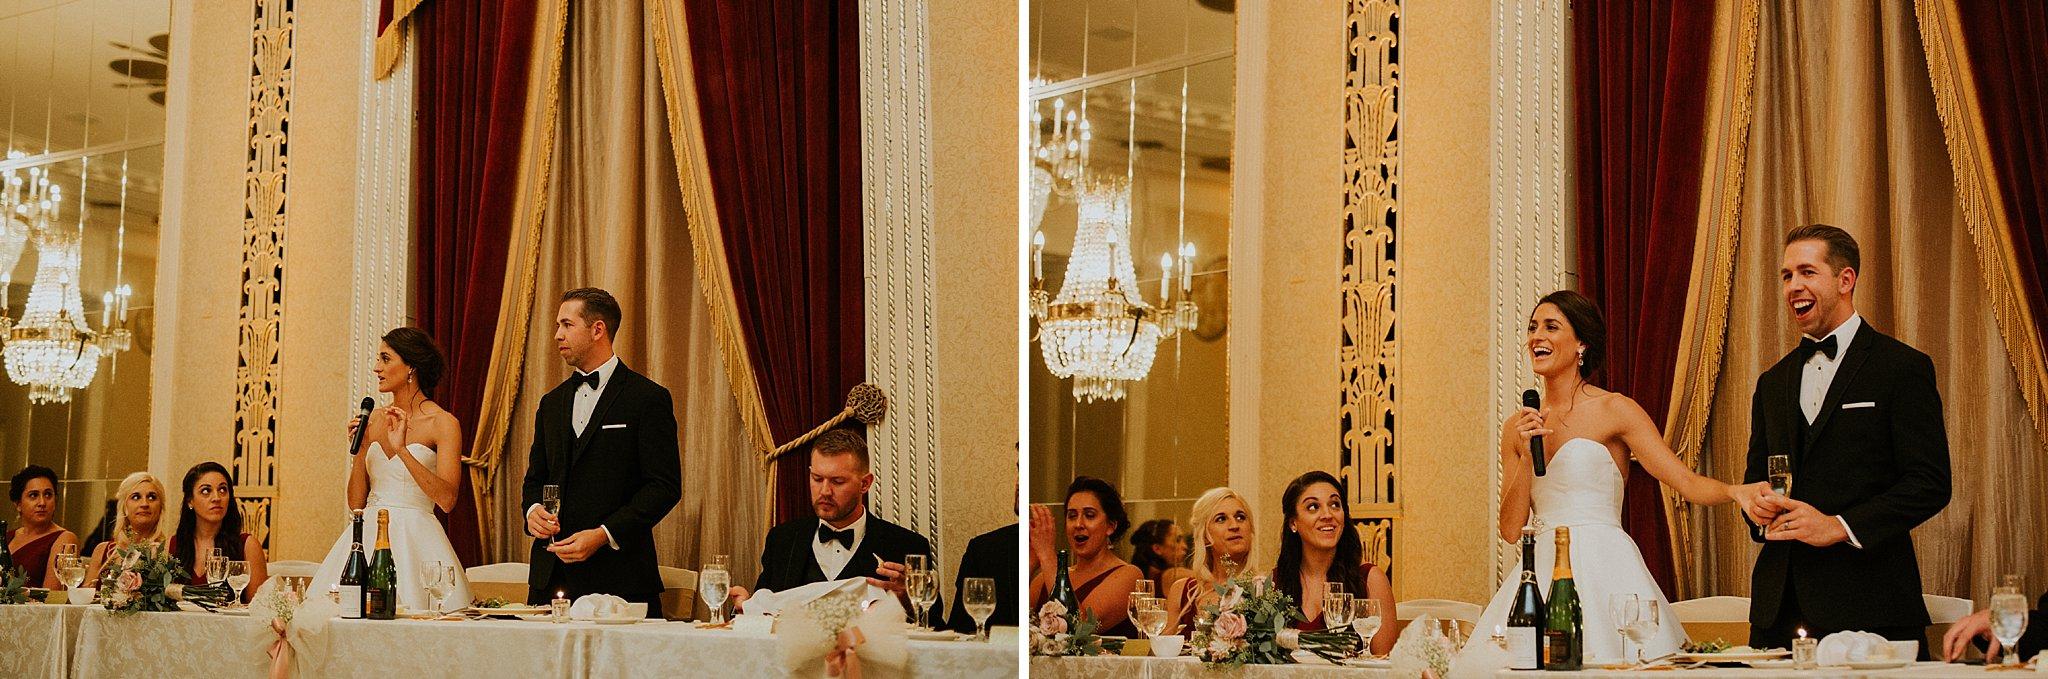 Matt-Lauren_St-Marys_Hilton-City-Center-Milwaukee-Wedding_liller-photo_0073.jpg